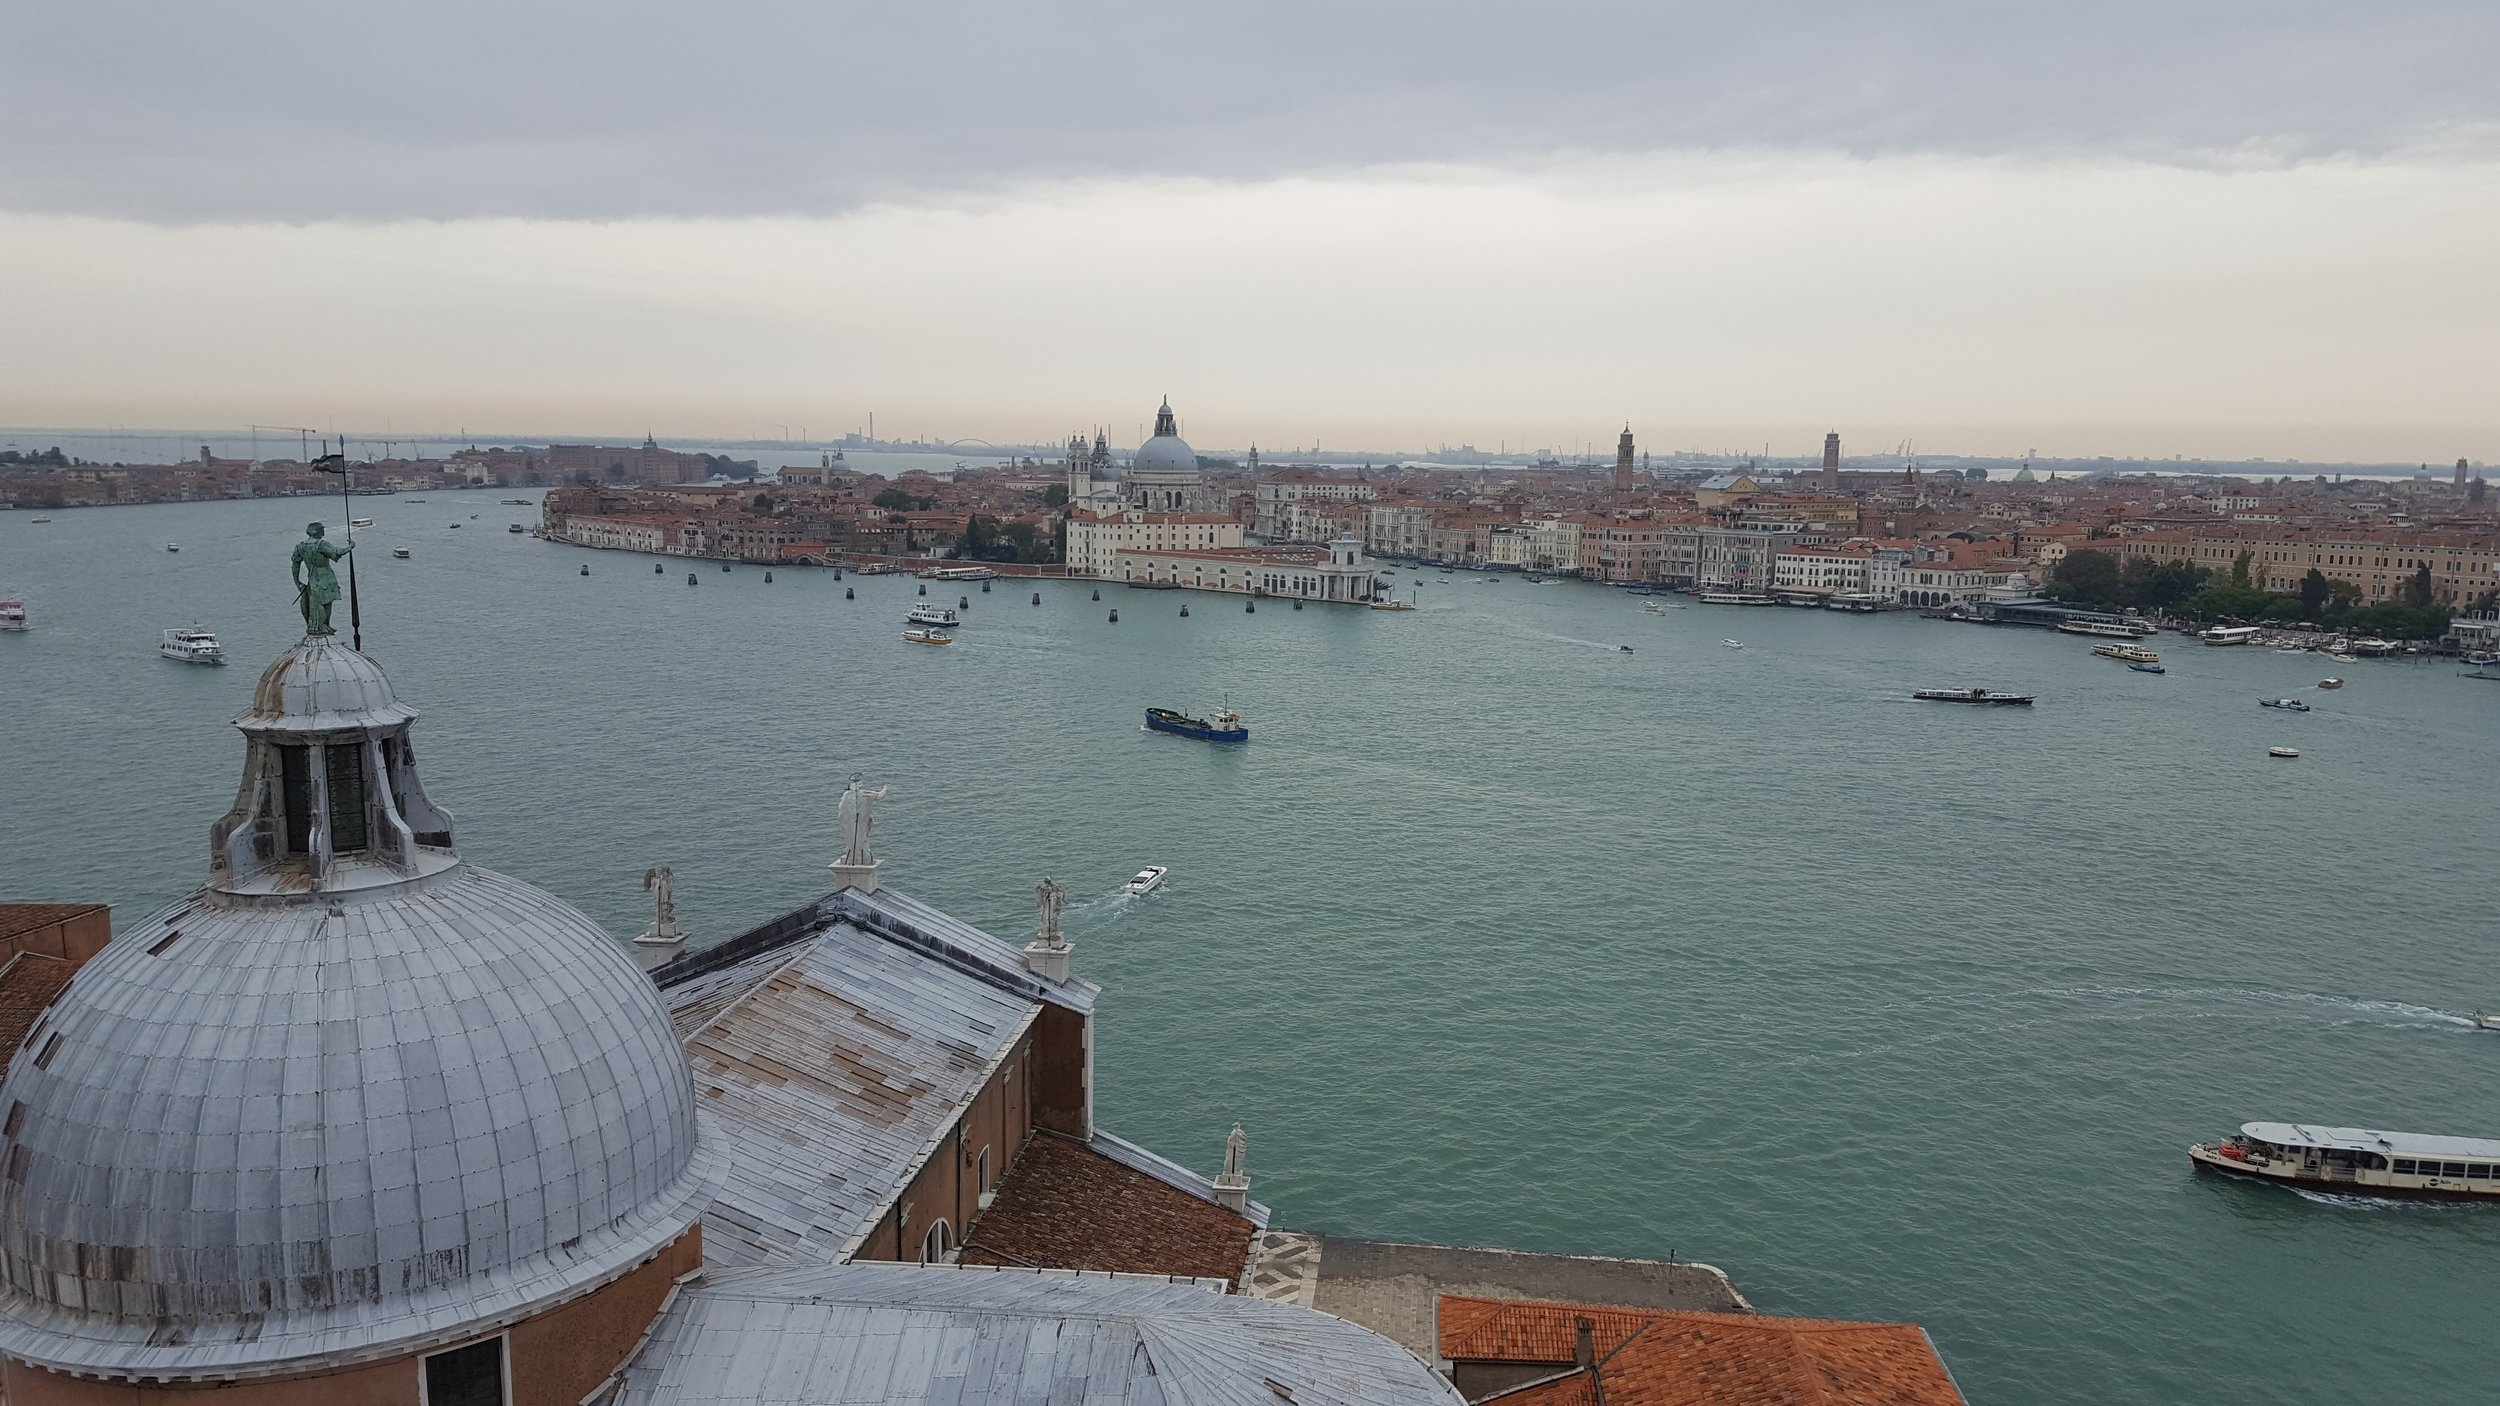 The Campanile di San Giorgio offers the best view in all of Venice